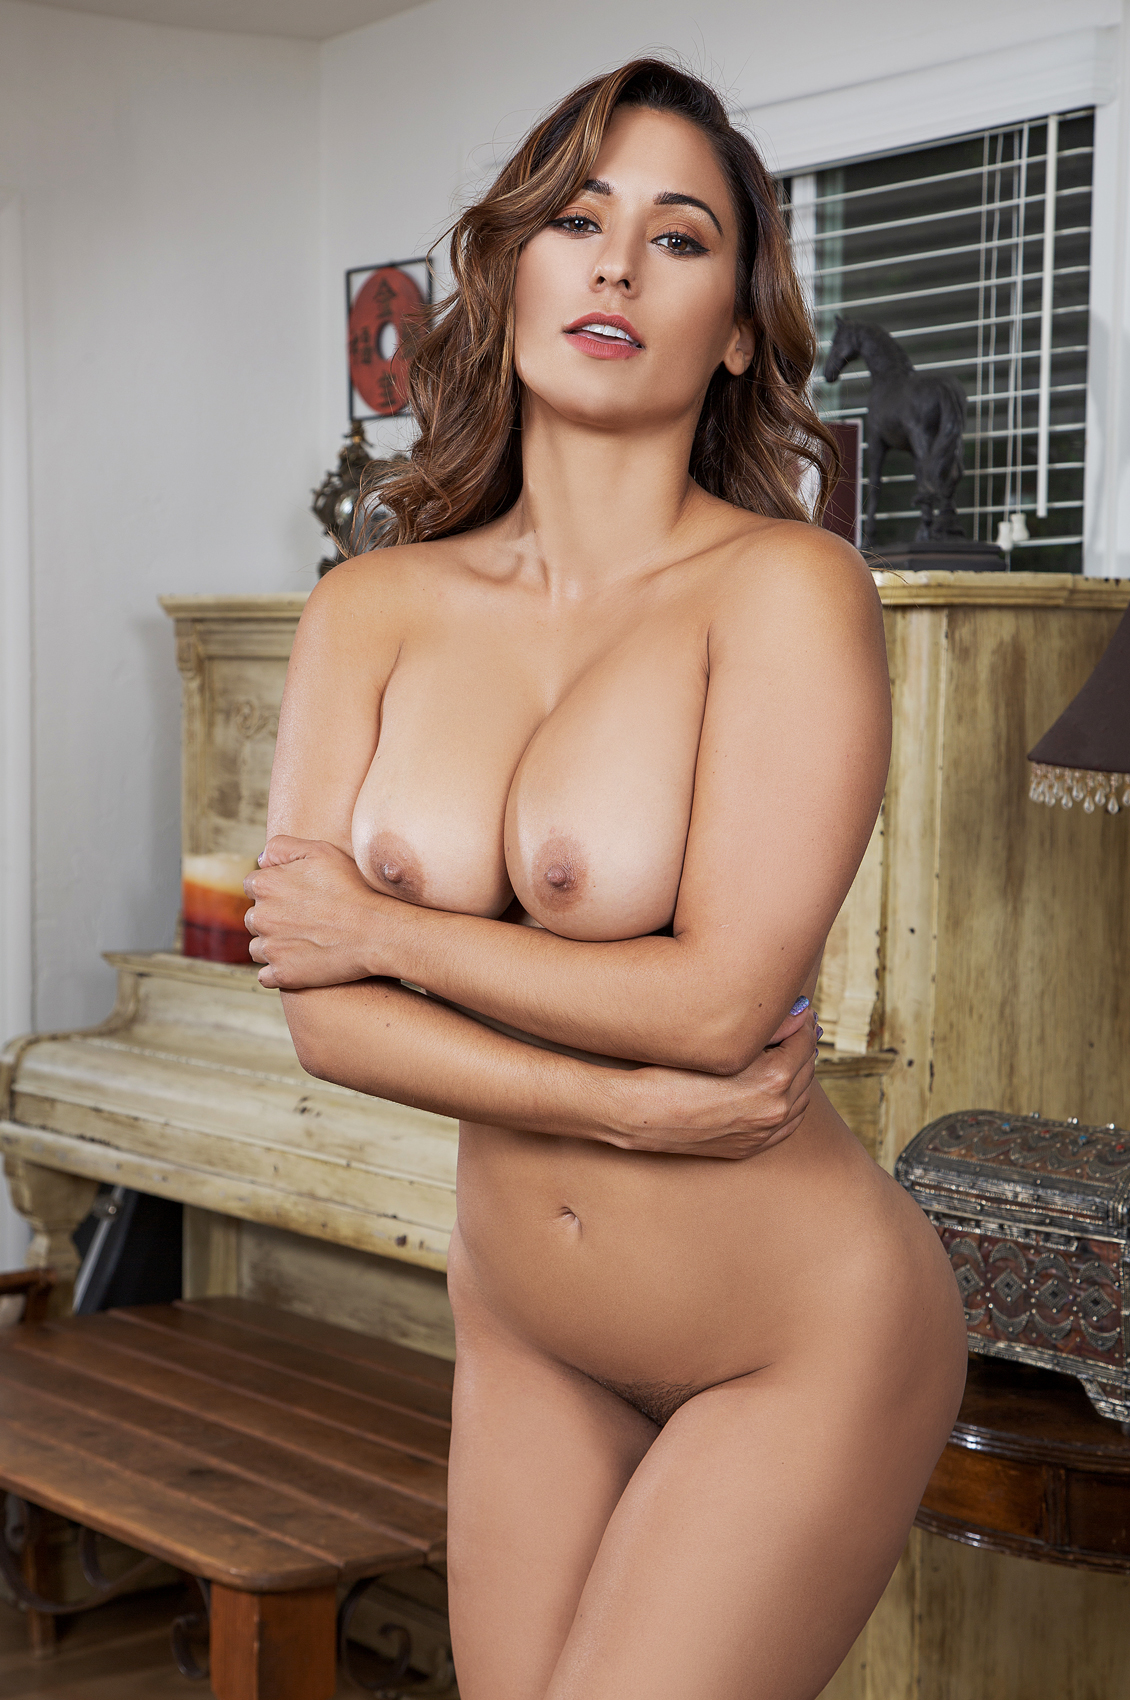 Reena Sky's Bio, Free Nude Pics & VR Porn Videos